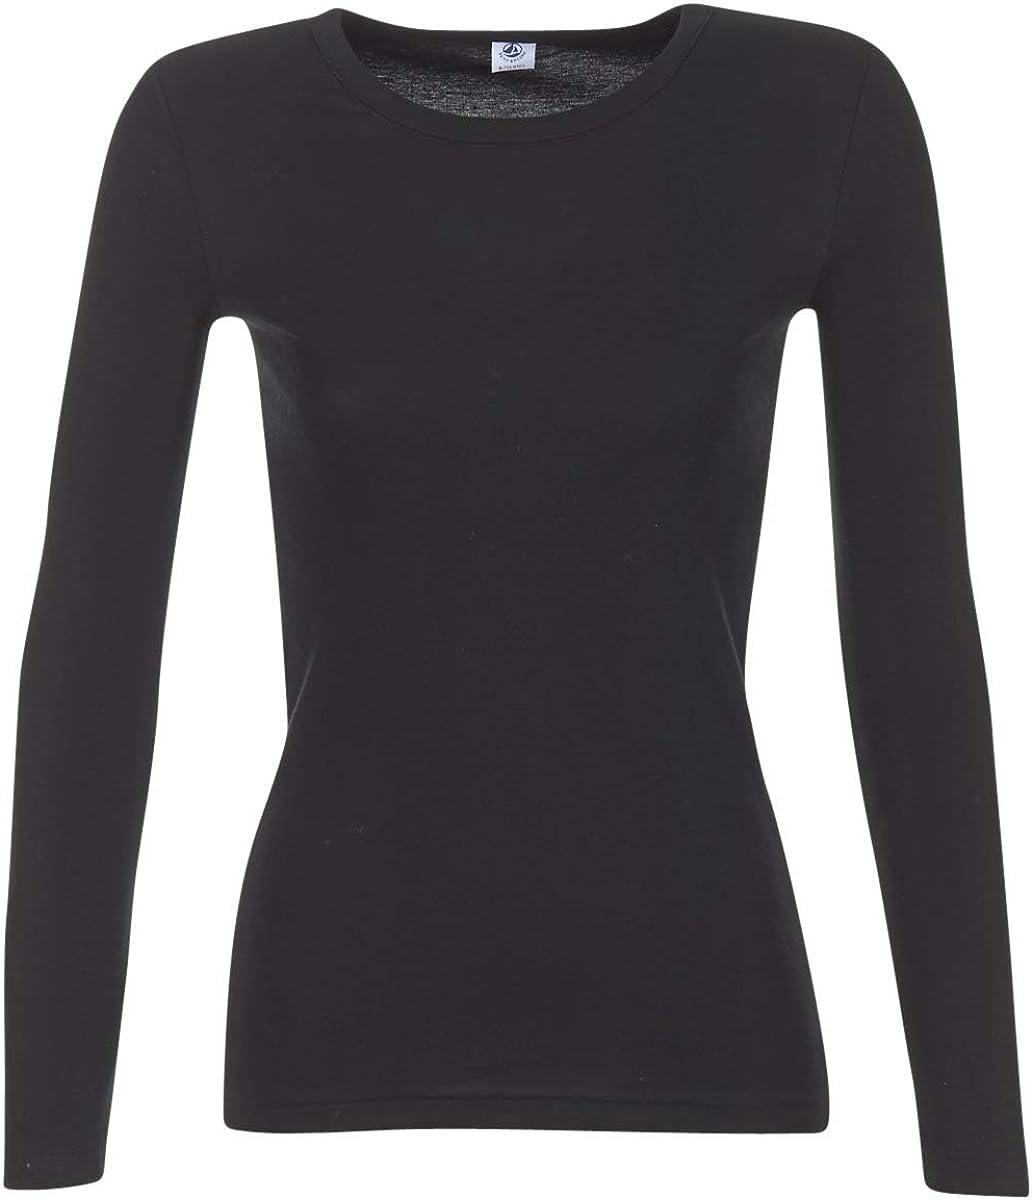 Petit Bateau Women's Black Long-Sleeved Iconic T-Shirt Sizes XXS-XL Style 14897-53409